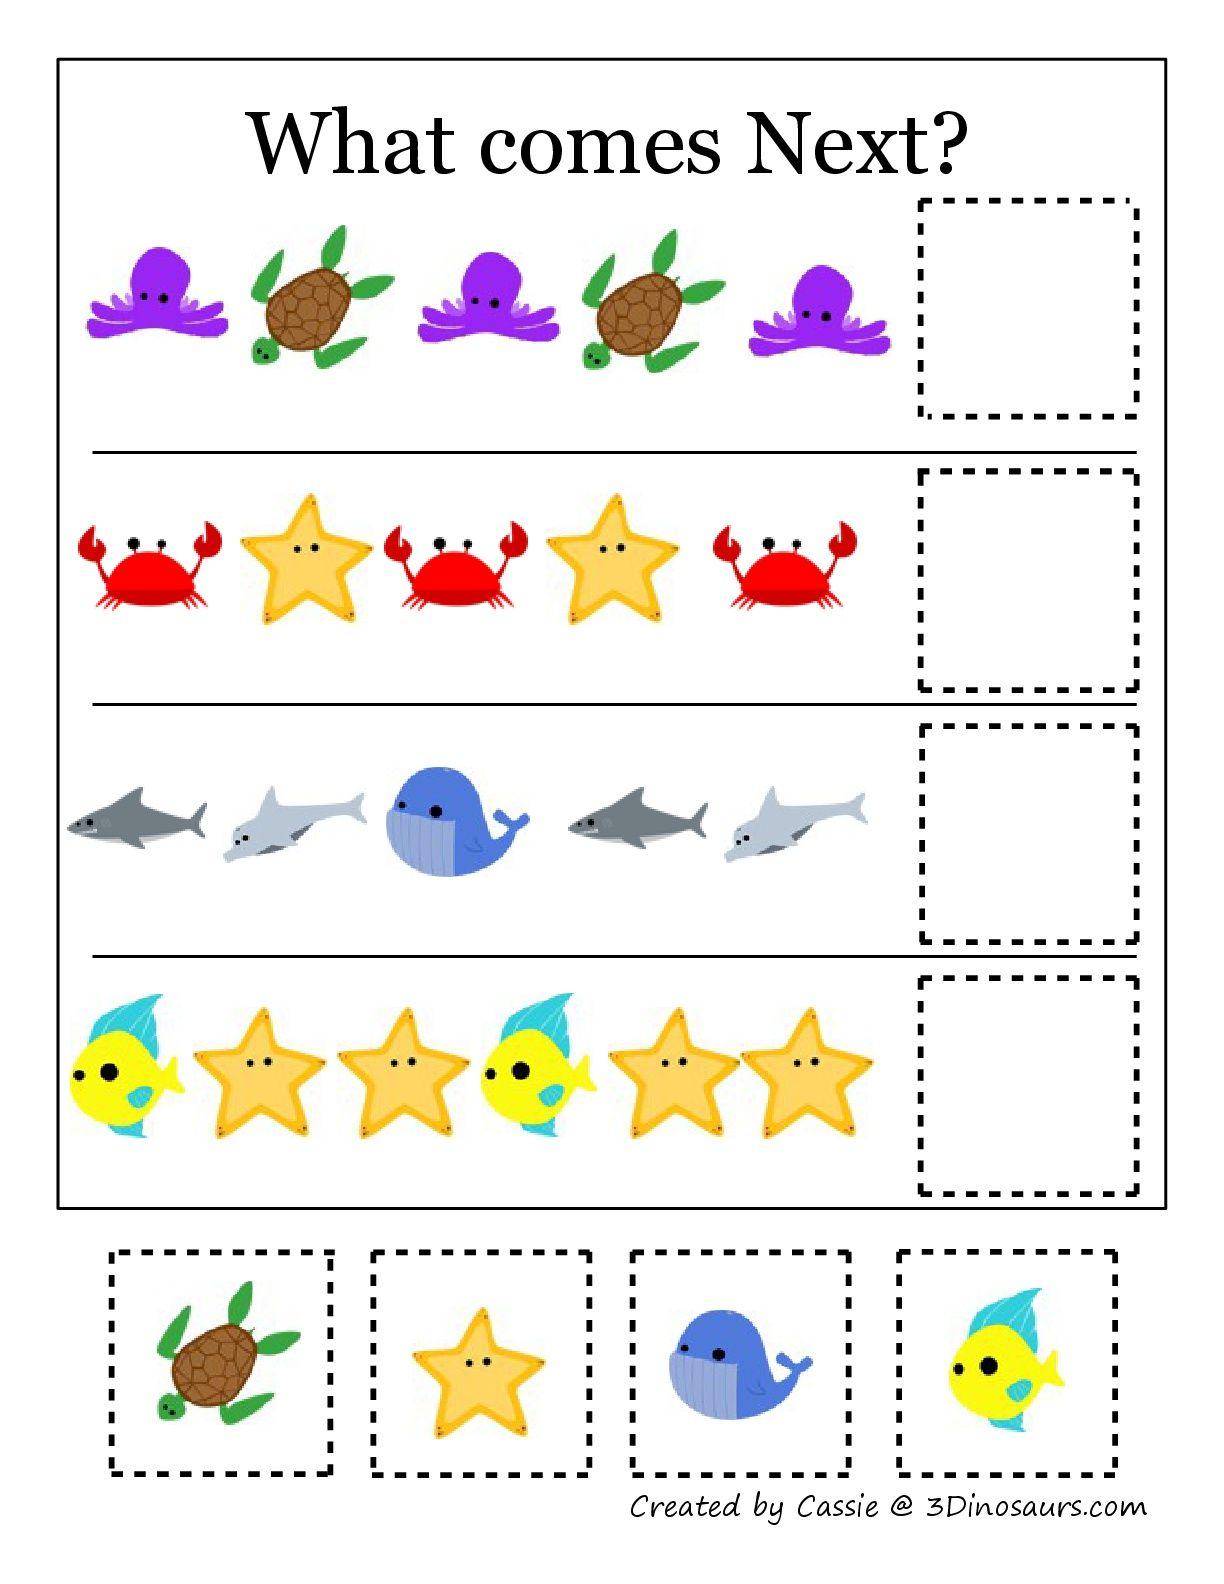 Pin Oleh Di Puzzles Word Search Crosswords